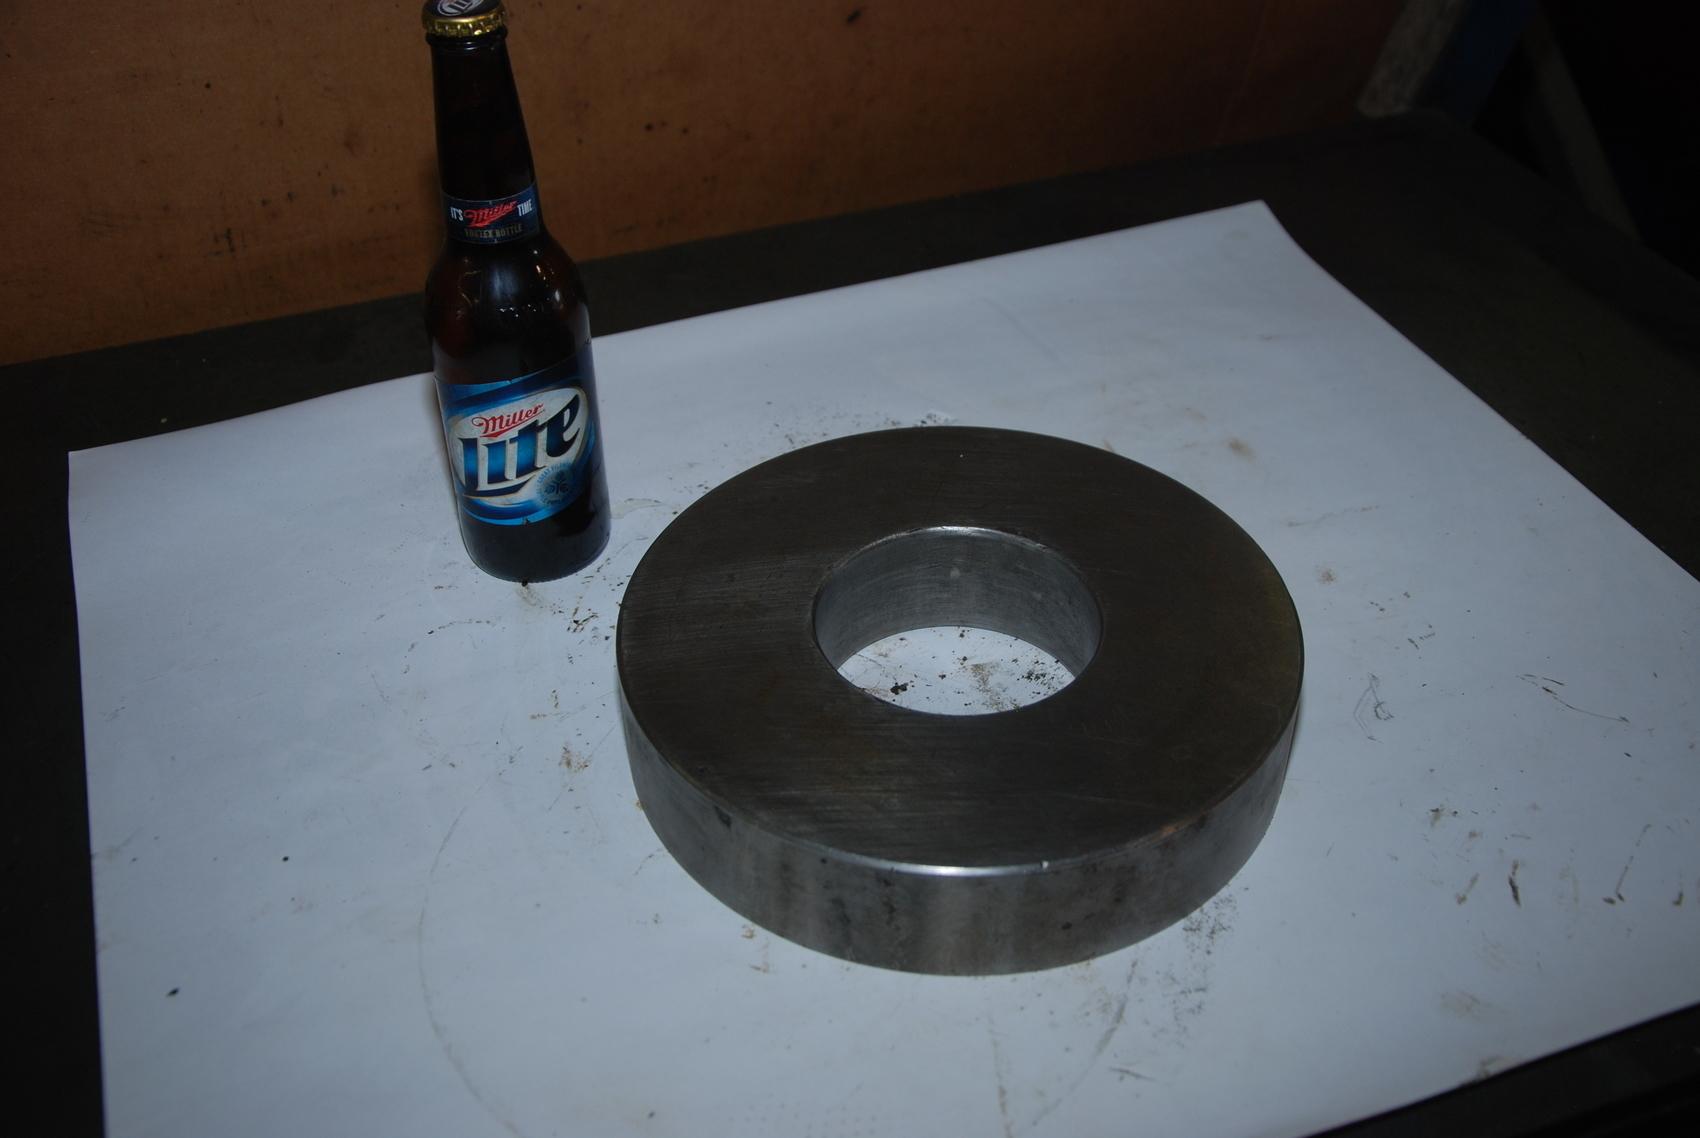 ONE Steel Round Bar for Blacksmith 32lbs;9 1/2x2 Inside Hole 4x2